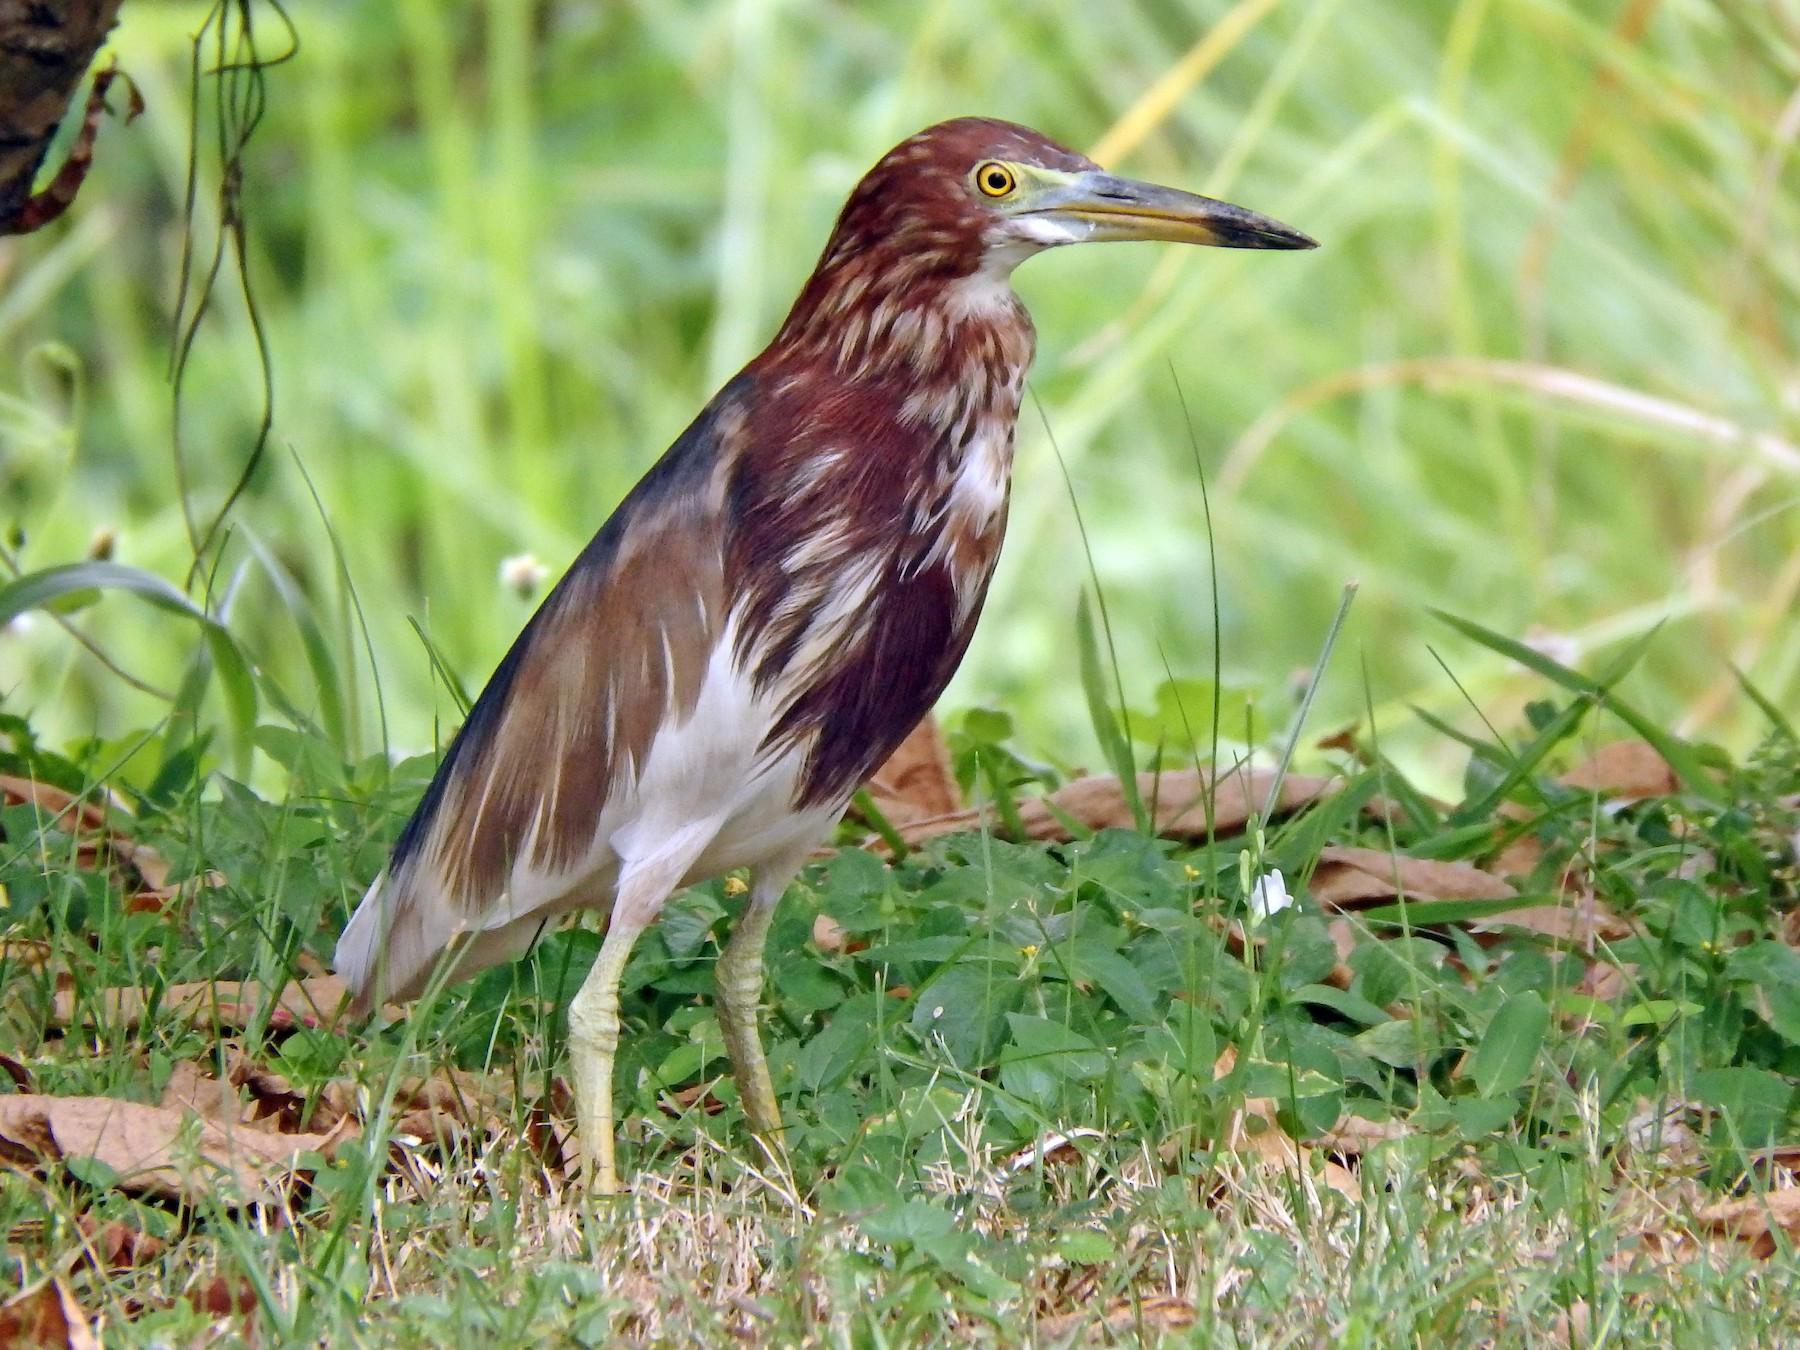 Chinese Pond-Heron - Kian Guan Tay